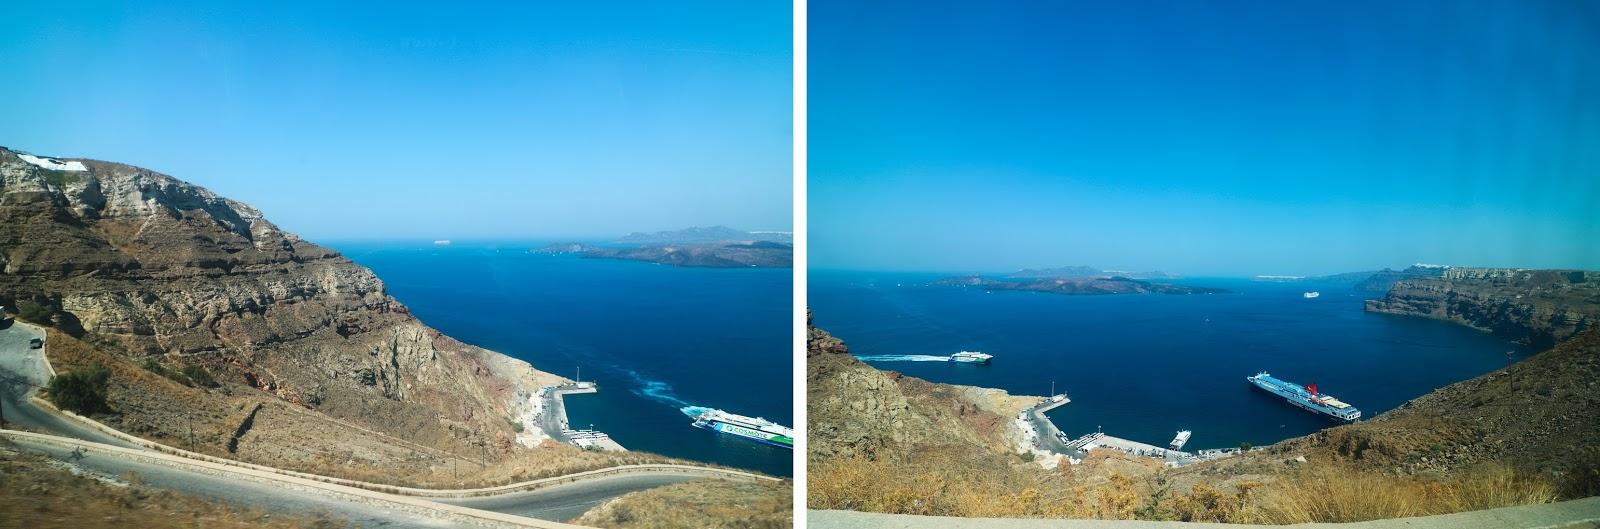 Santorini, Athinios Port, z Krety na Santorini, port,